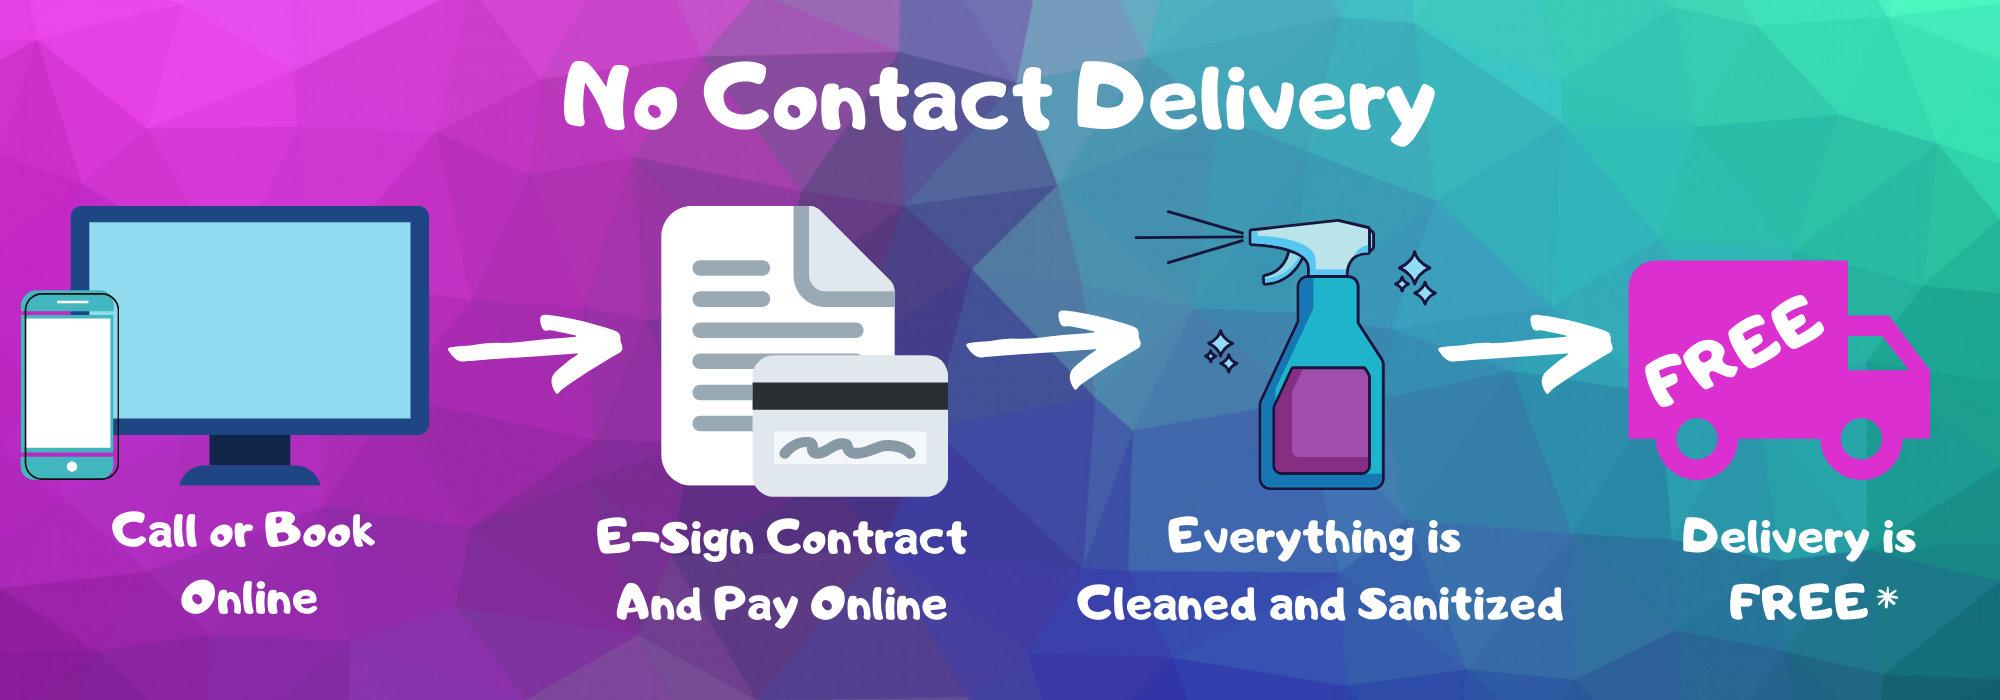 No contact delivery